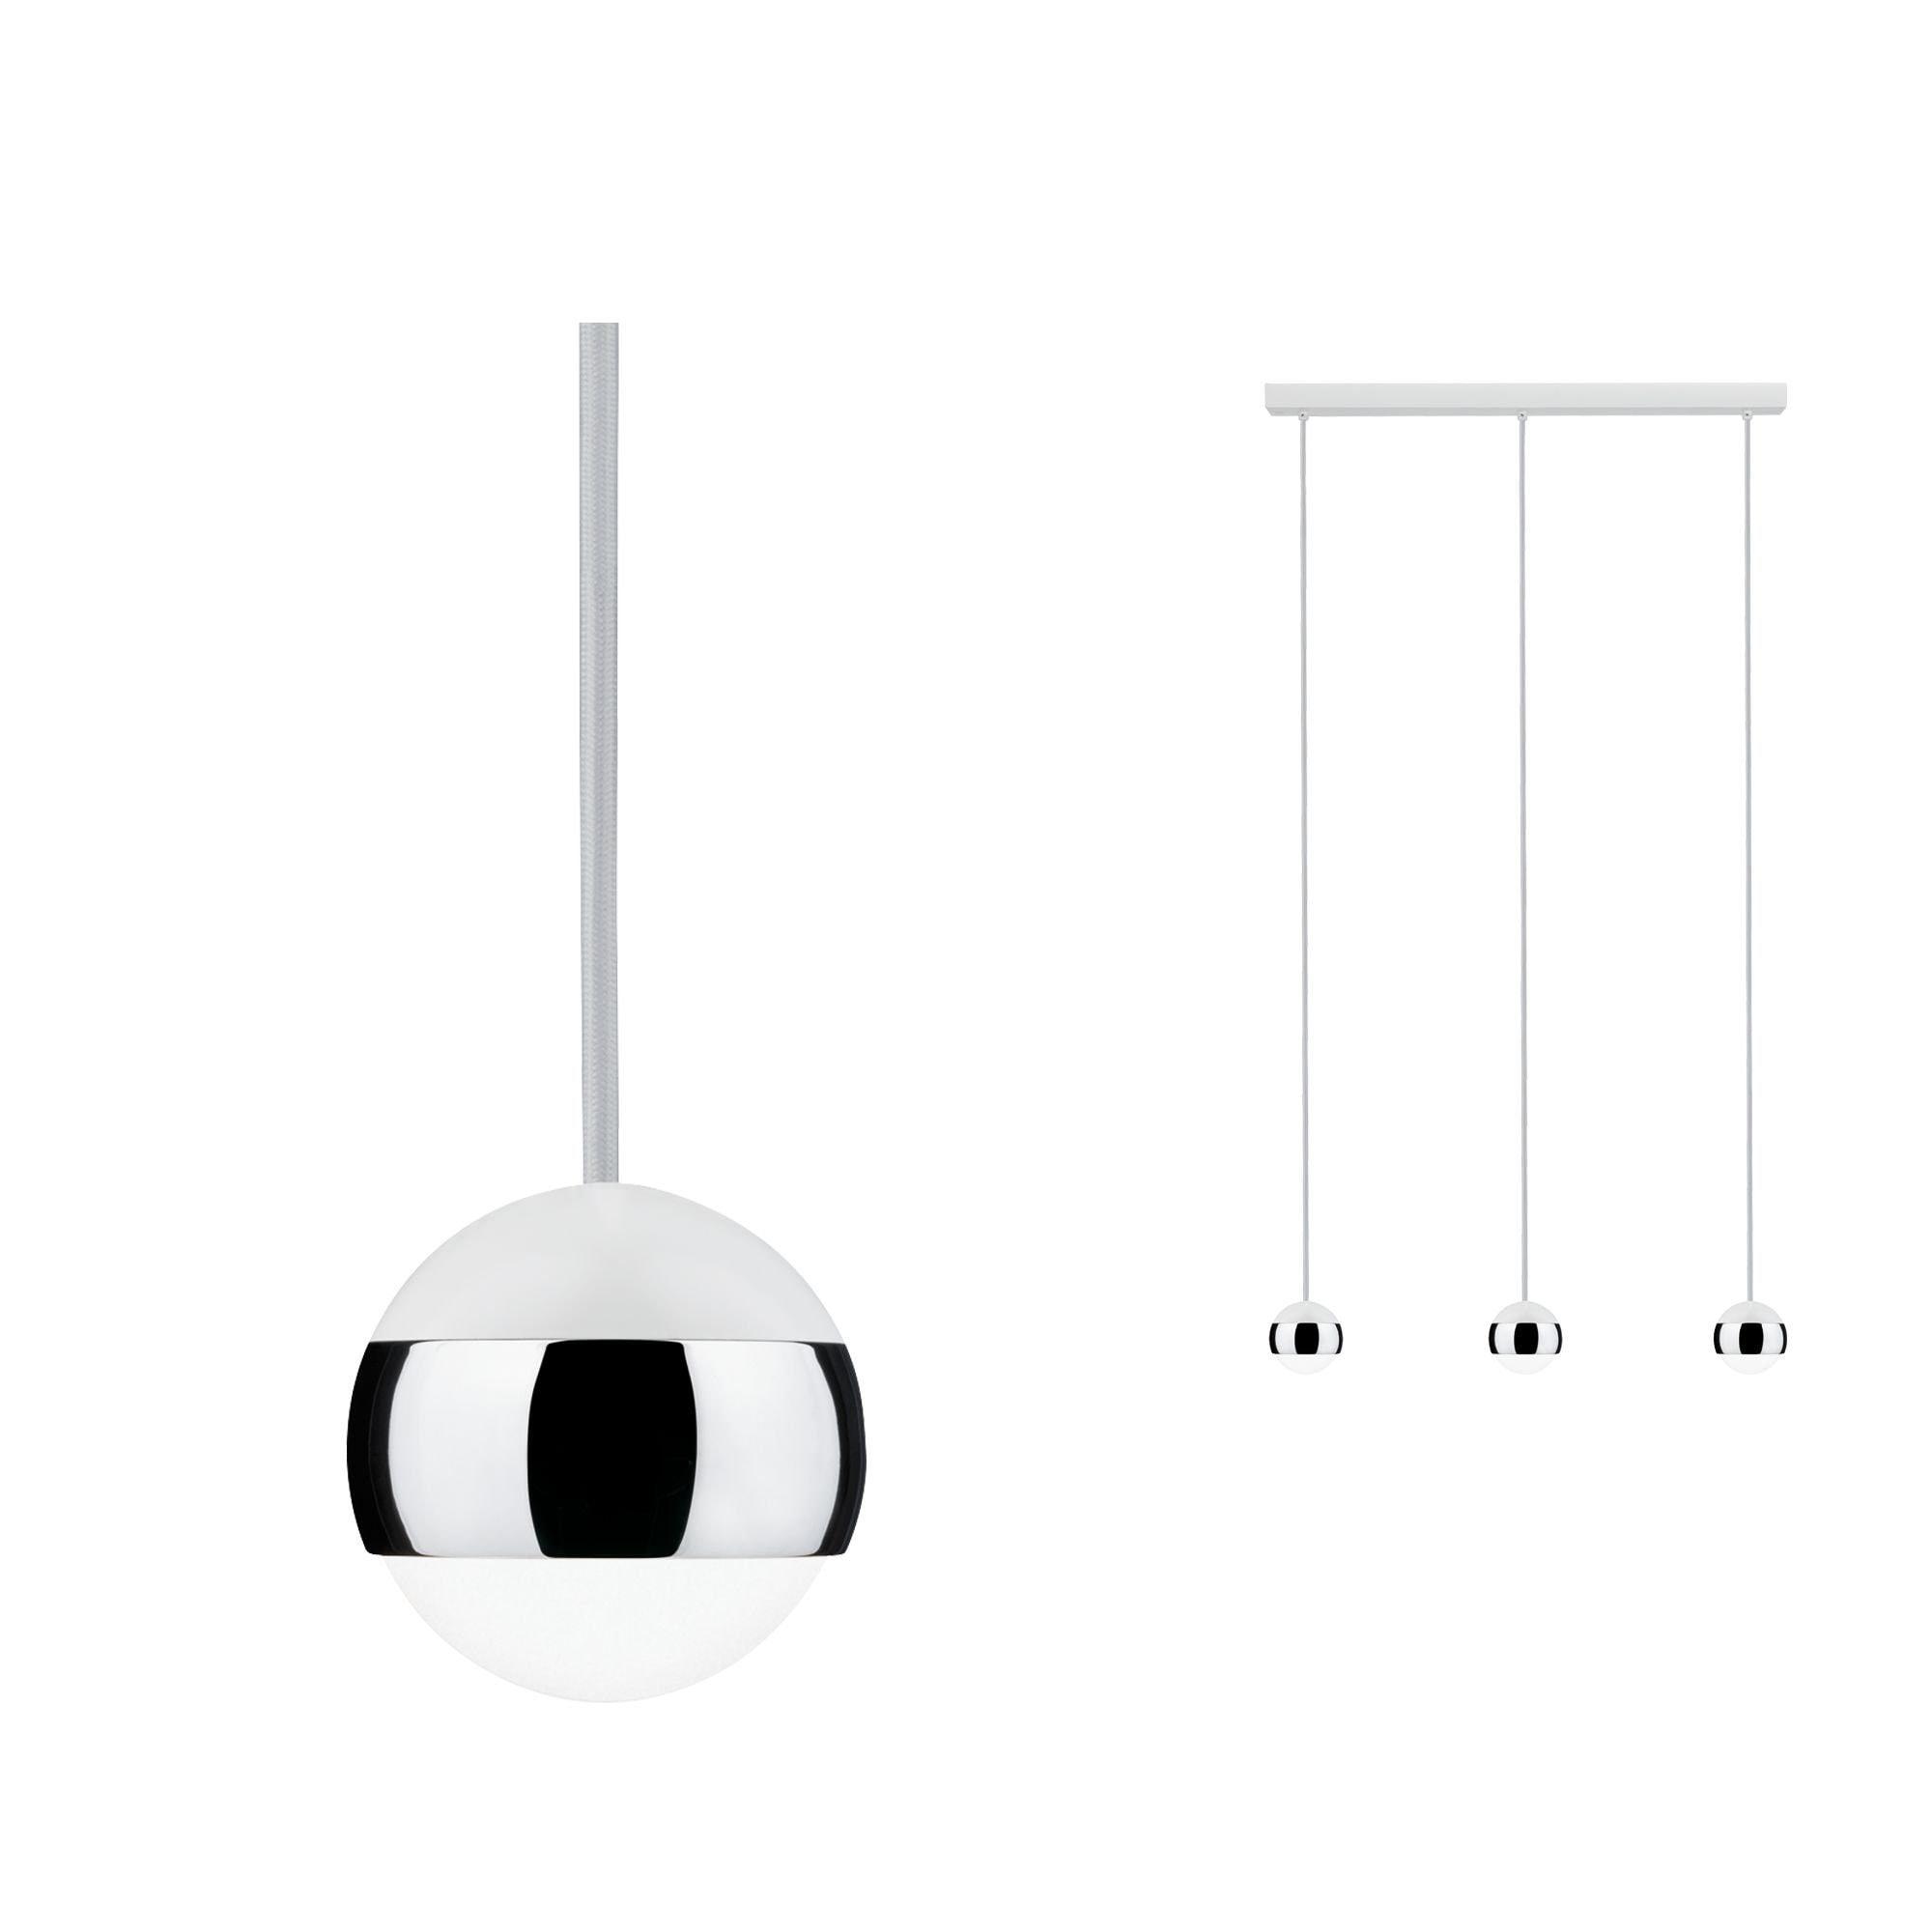 Paulmann LED Pendelleuchte Capsule 3x6W Weiß/Chrom, 1 St., Warmweiß